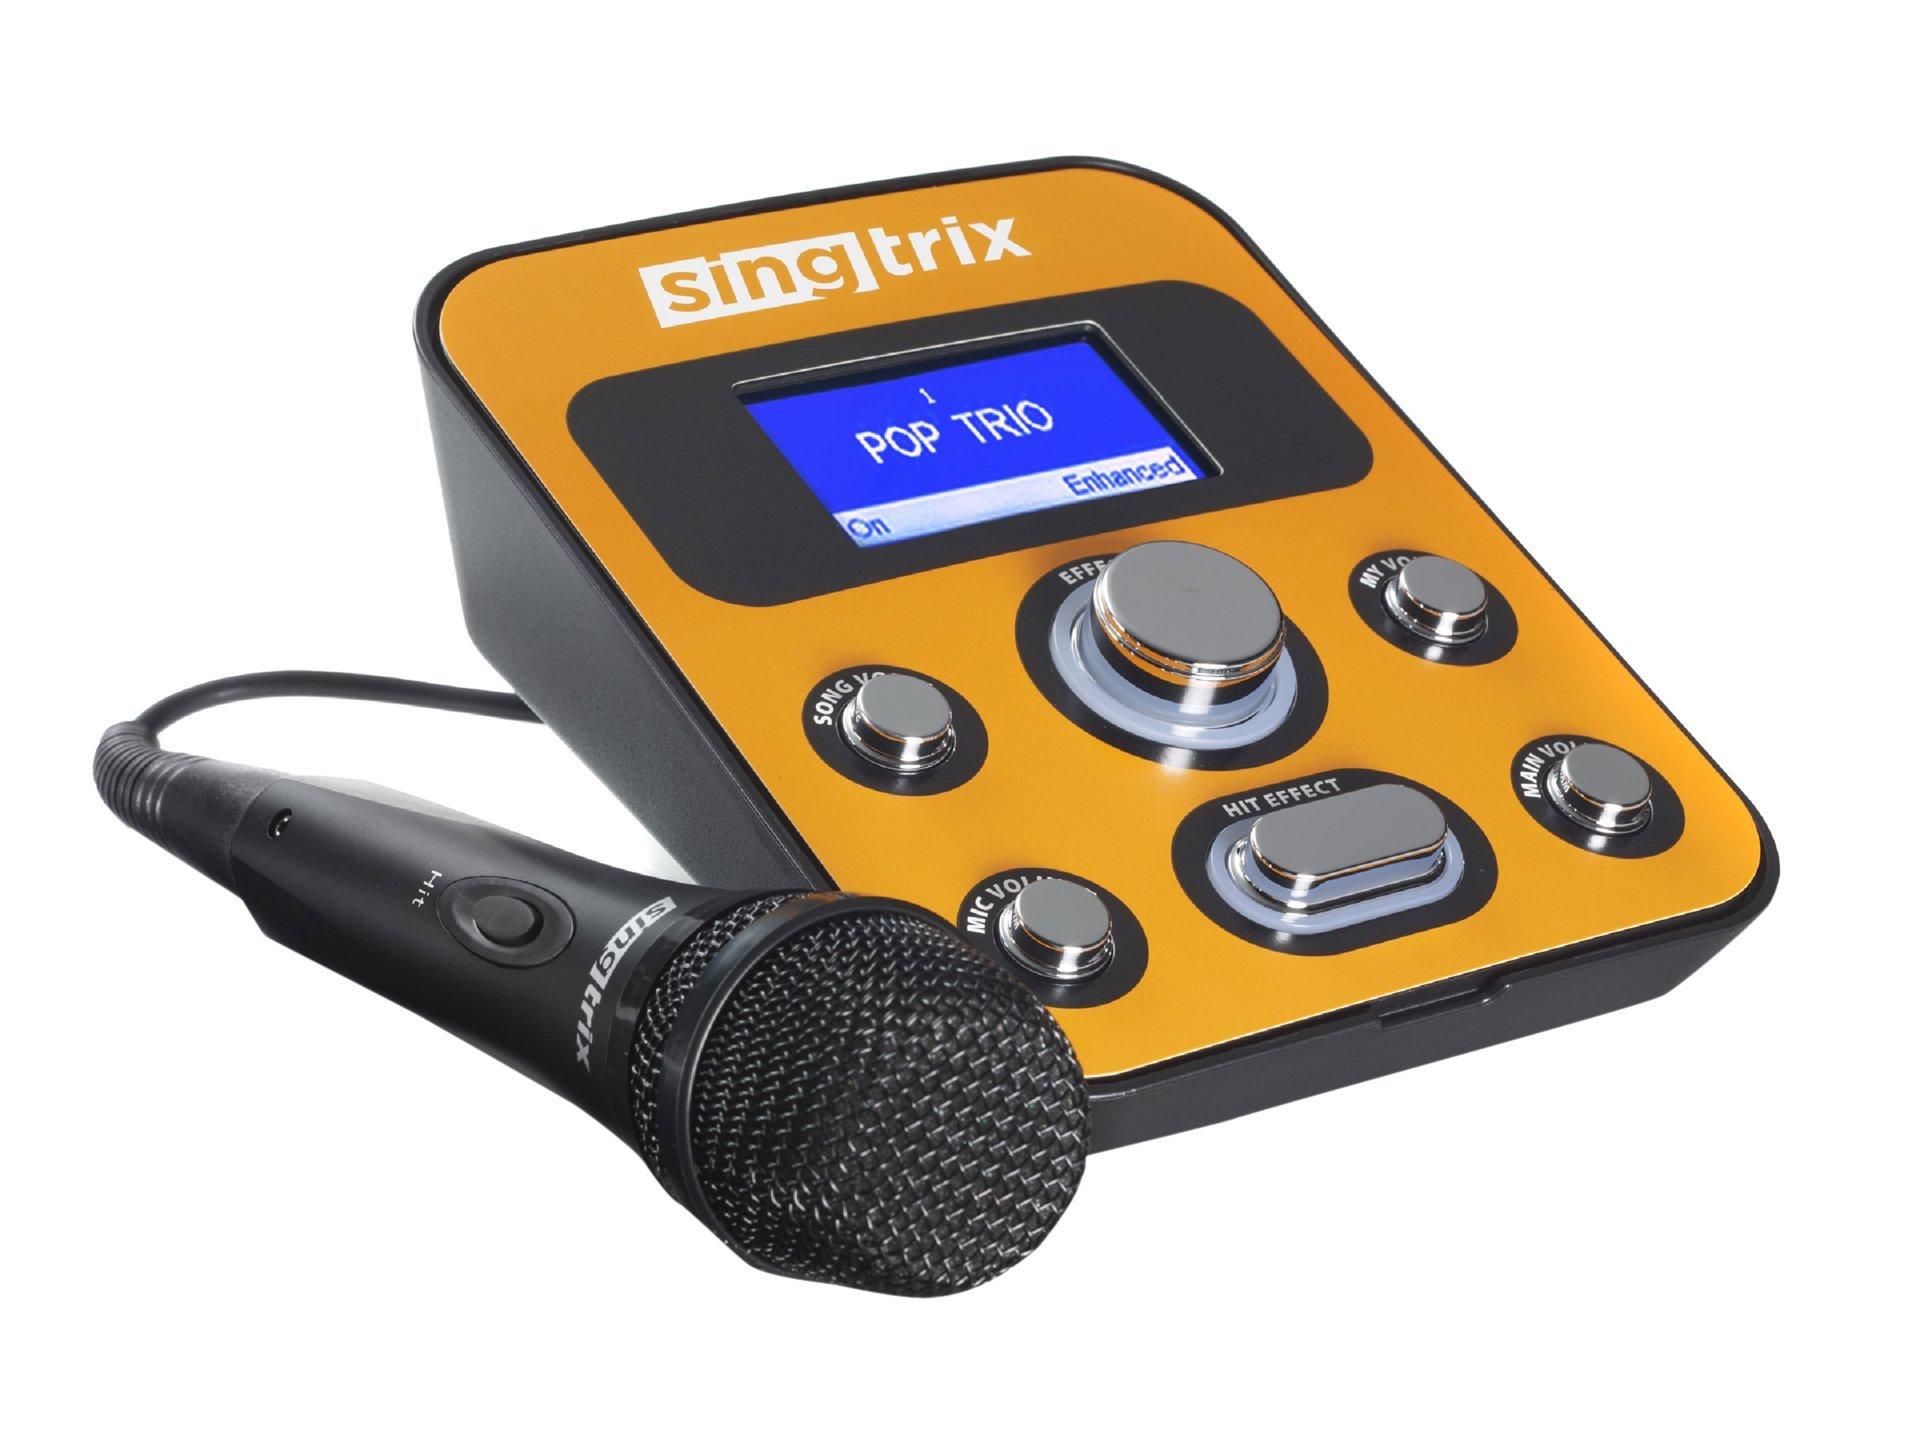 Singtrix SGTXPB1 Personal Bundle Home Karaoke System